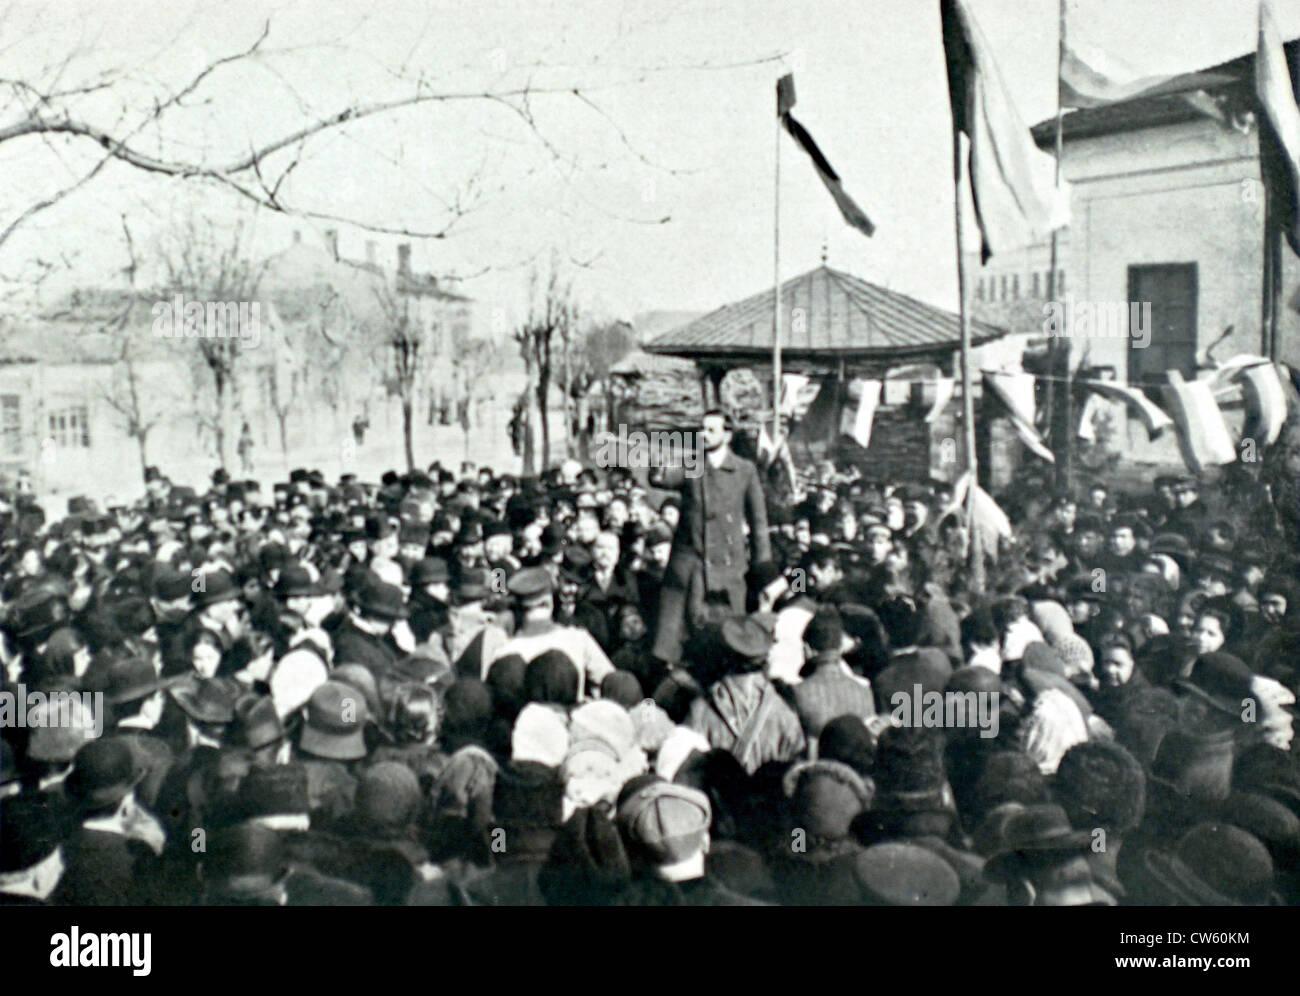 Bulgaria. War of the Balkans. Demonstration in Silistria (1913) - Stock Image